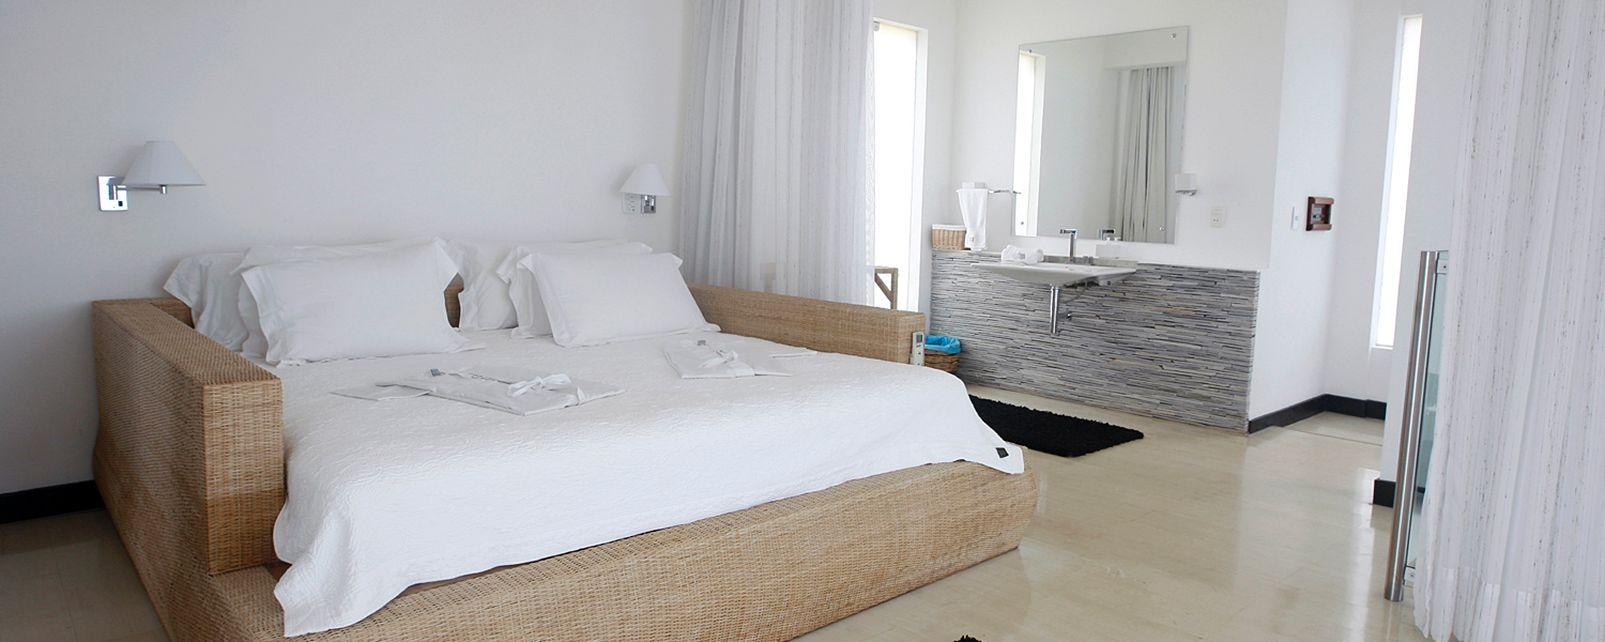 Hotel Kilombo Villas